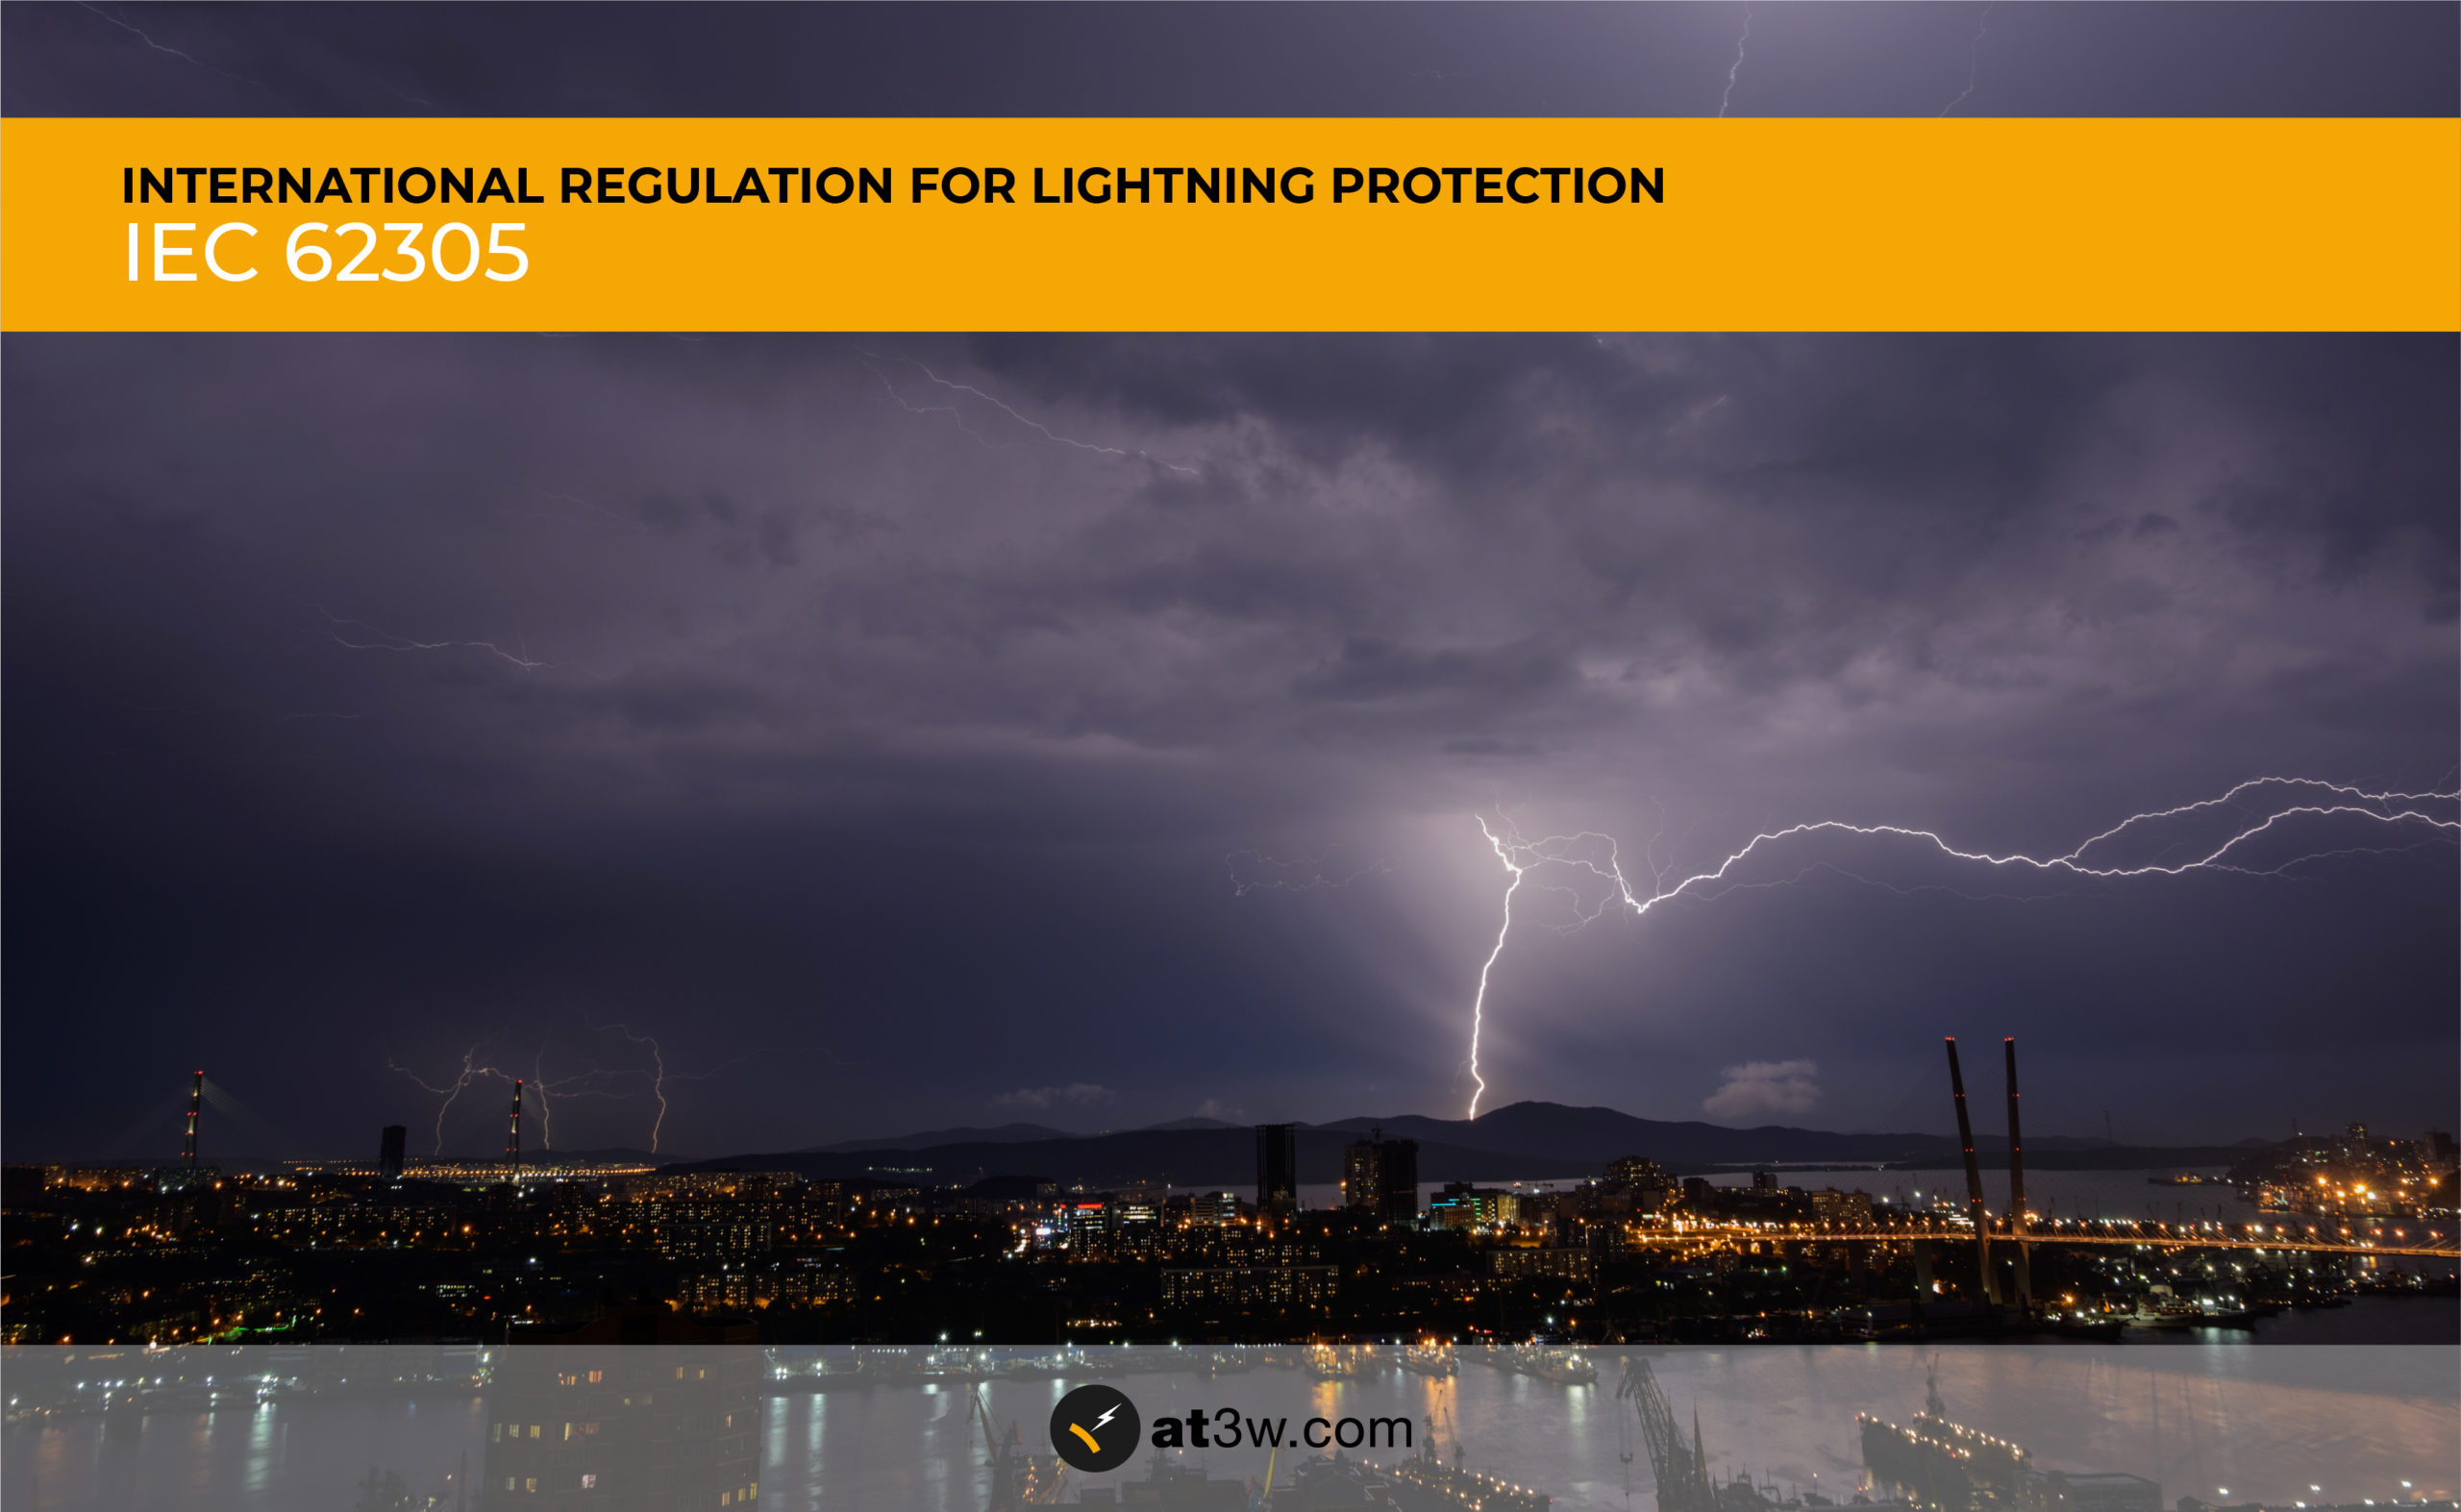 Aplicaciones Tecnológicas was present at the review of the international regulation IEC 62305 for lightning protection